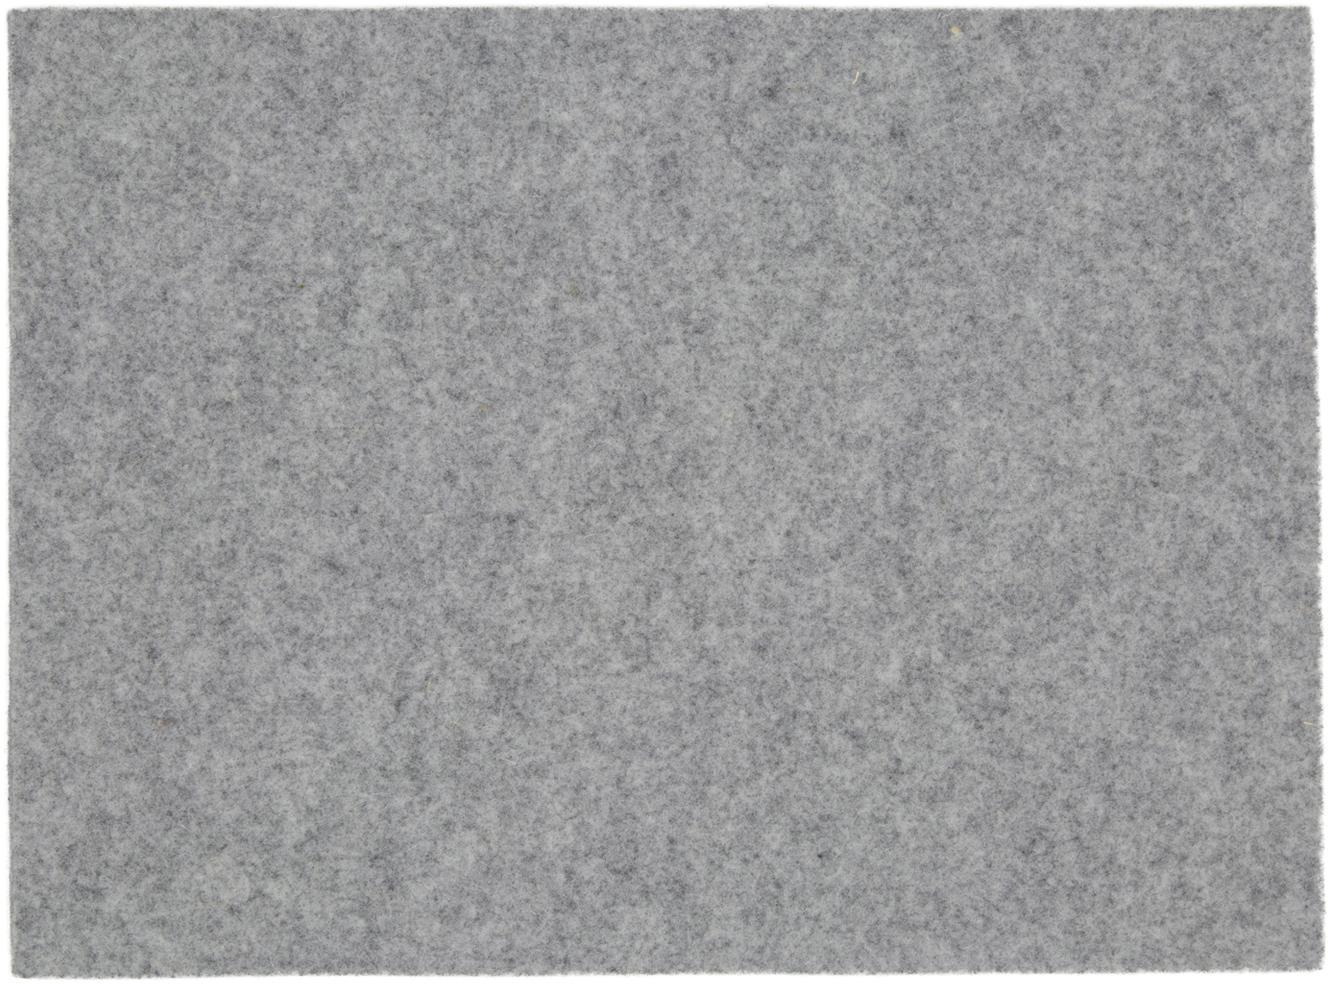 Vilt placemats Leandra, 4 stuks, 90% Wol, 10% Polyethyleen, Lichtgrijs, 33 x 45 cm